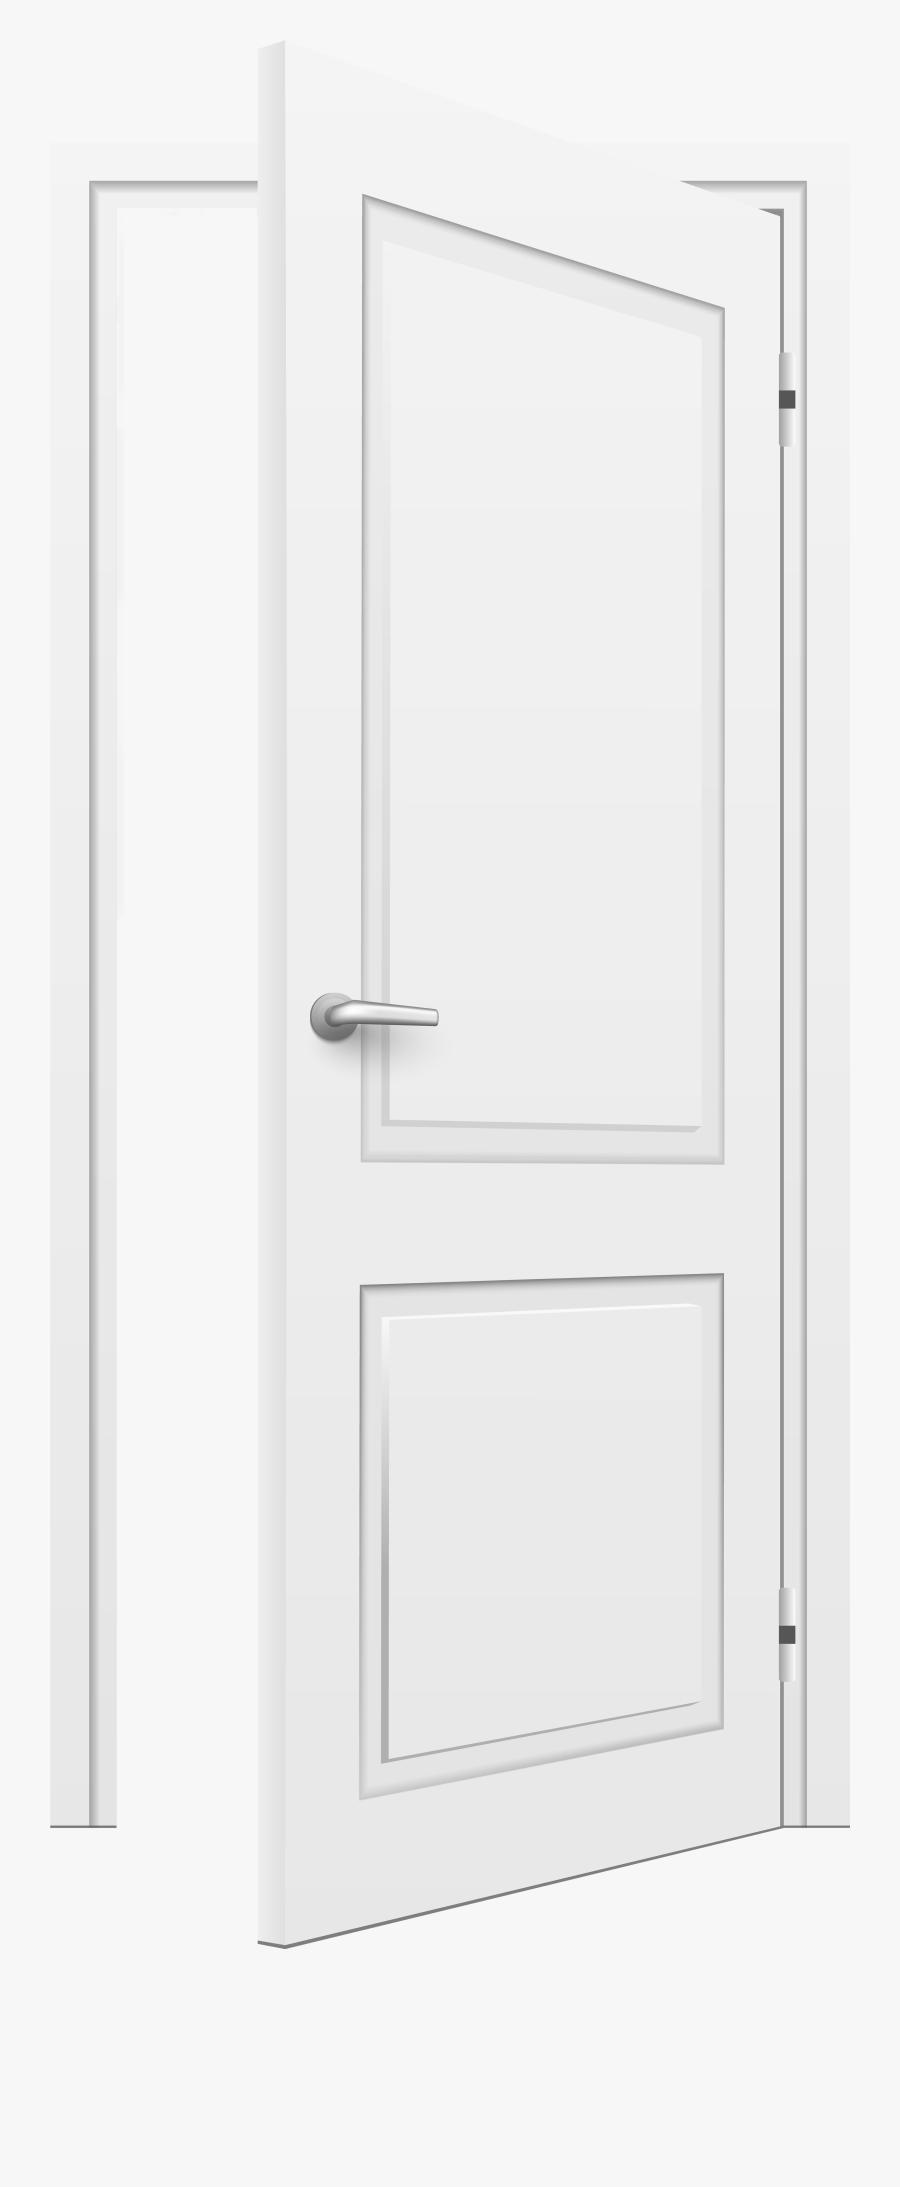 Transparent Door Clip Art - Open Door Png Transparent, Transparent Clipart